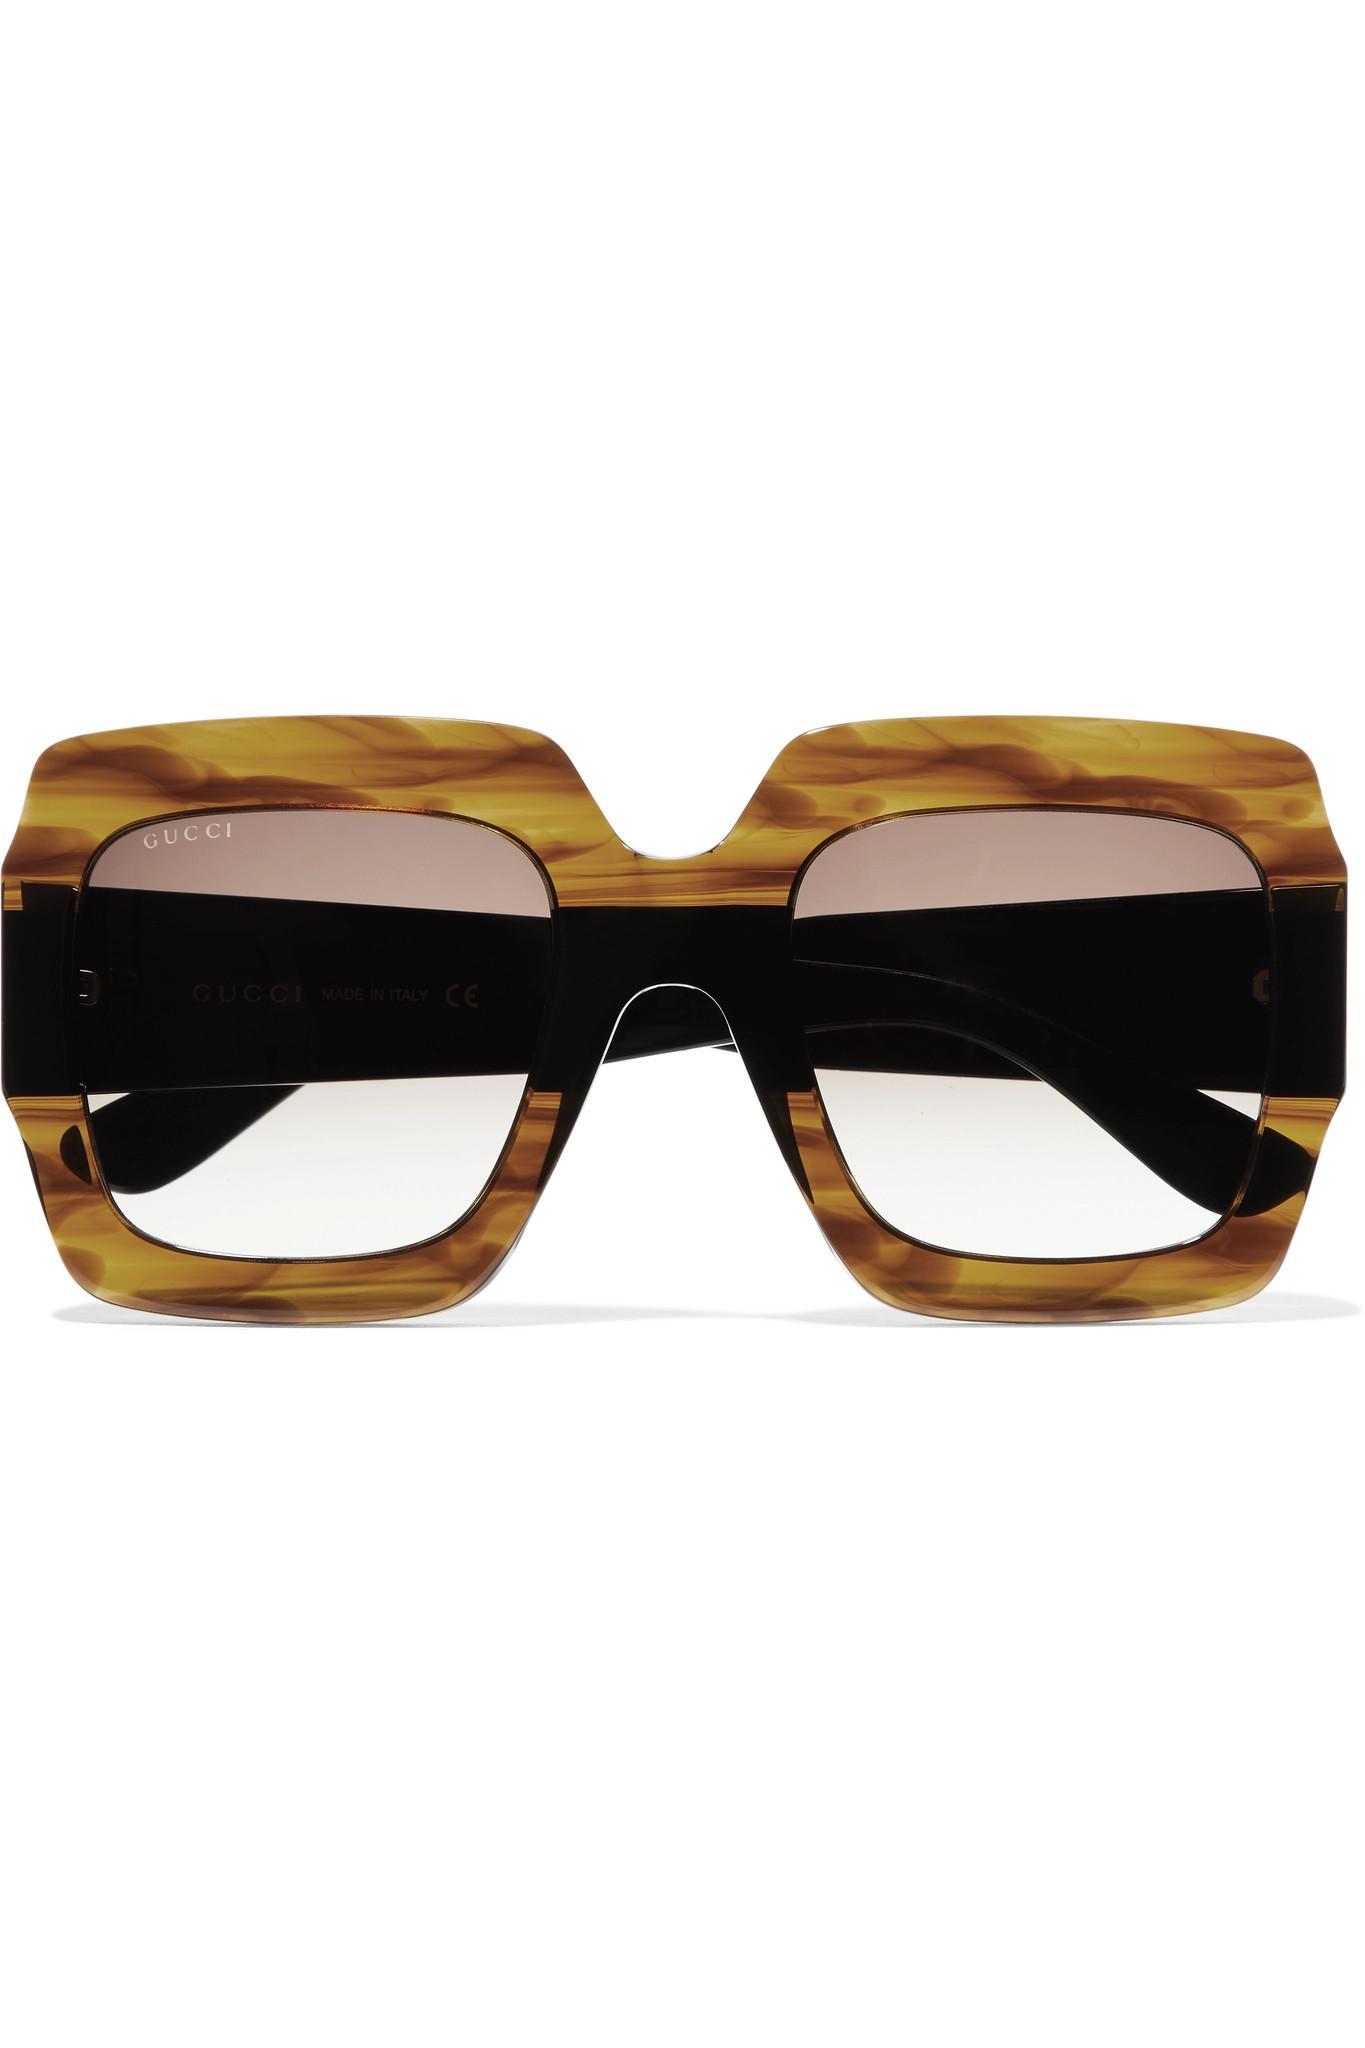 1e688295aa6 Gucci - Multicolor Oversized Square-frame Tortoiseshell Acetate Sunglasses  - Lyst. View fullscreen